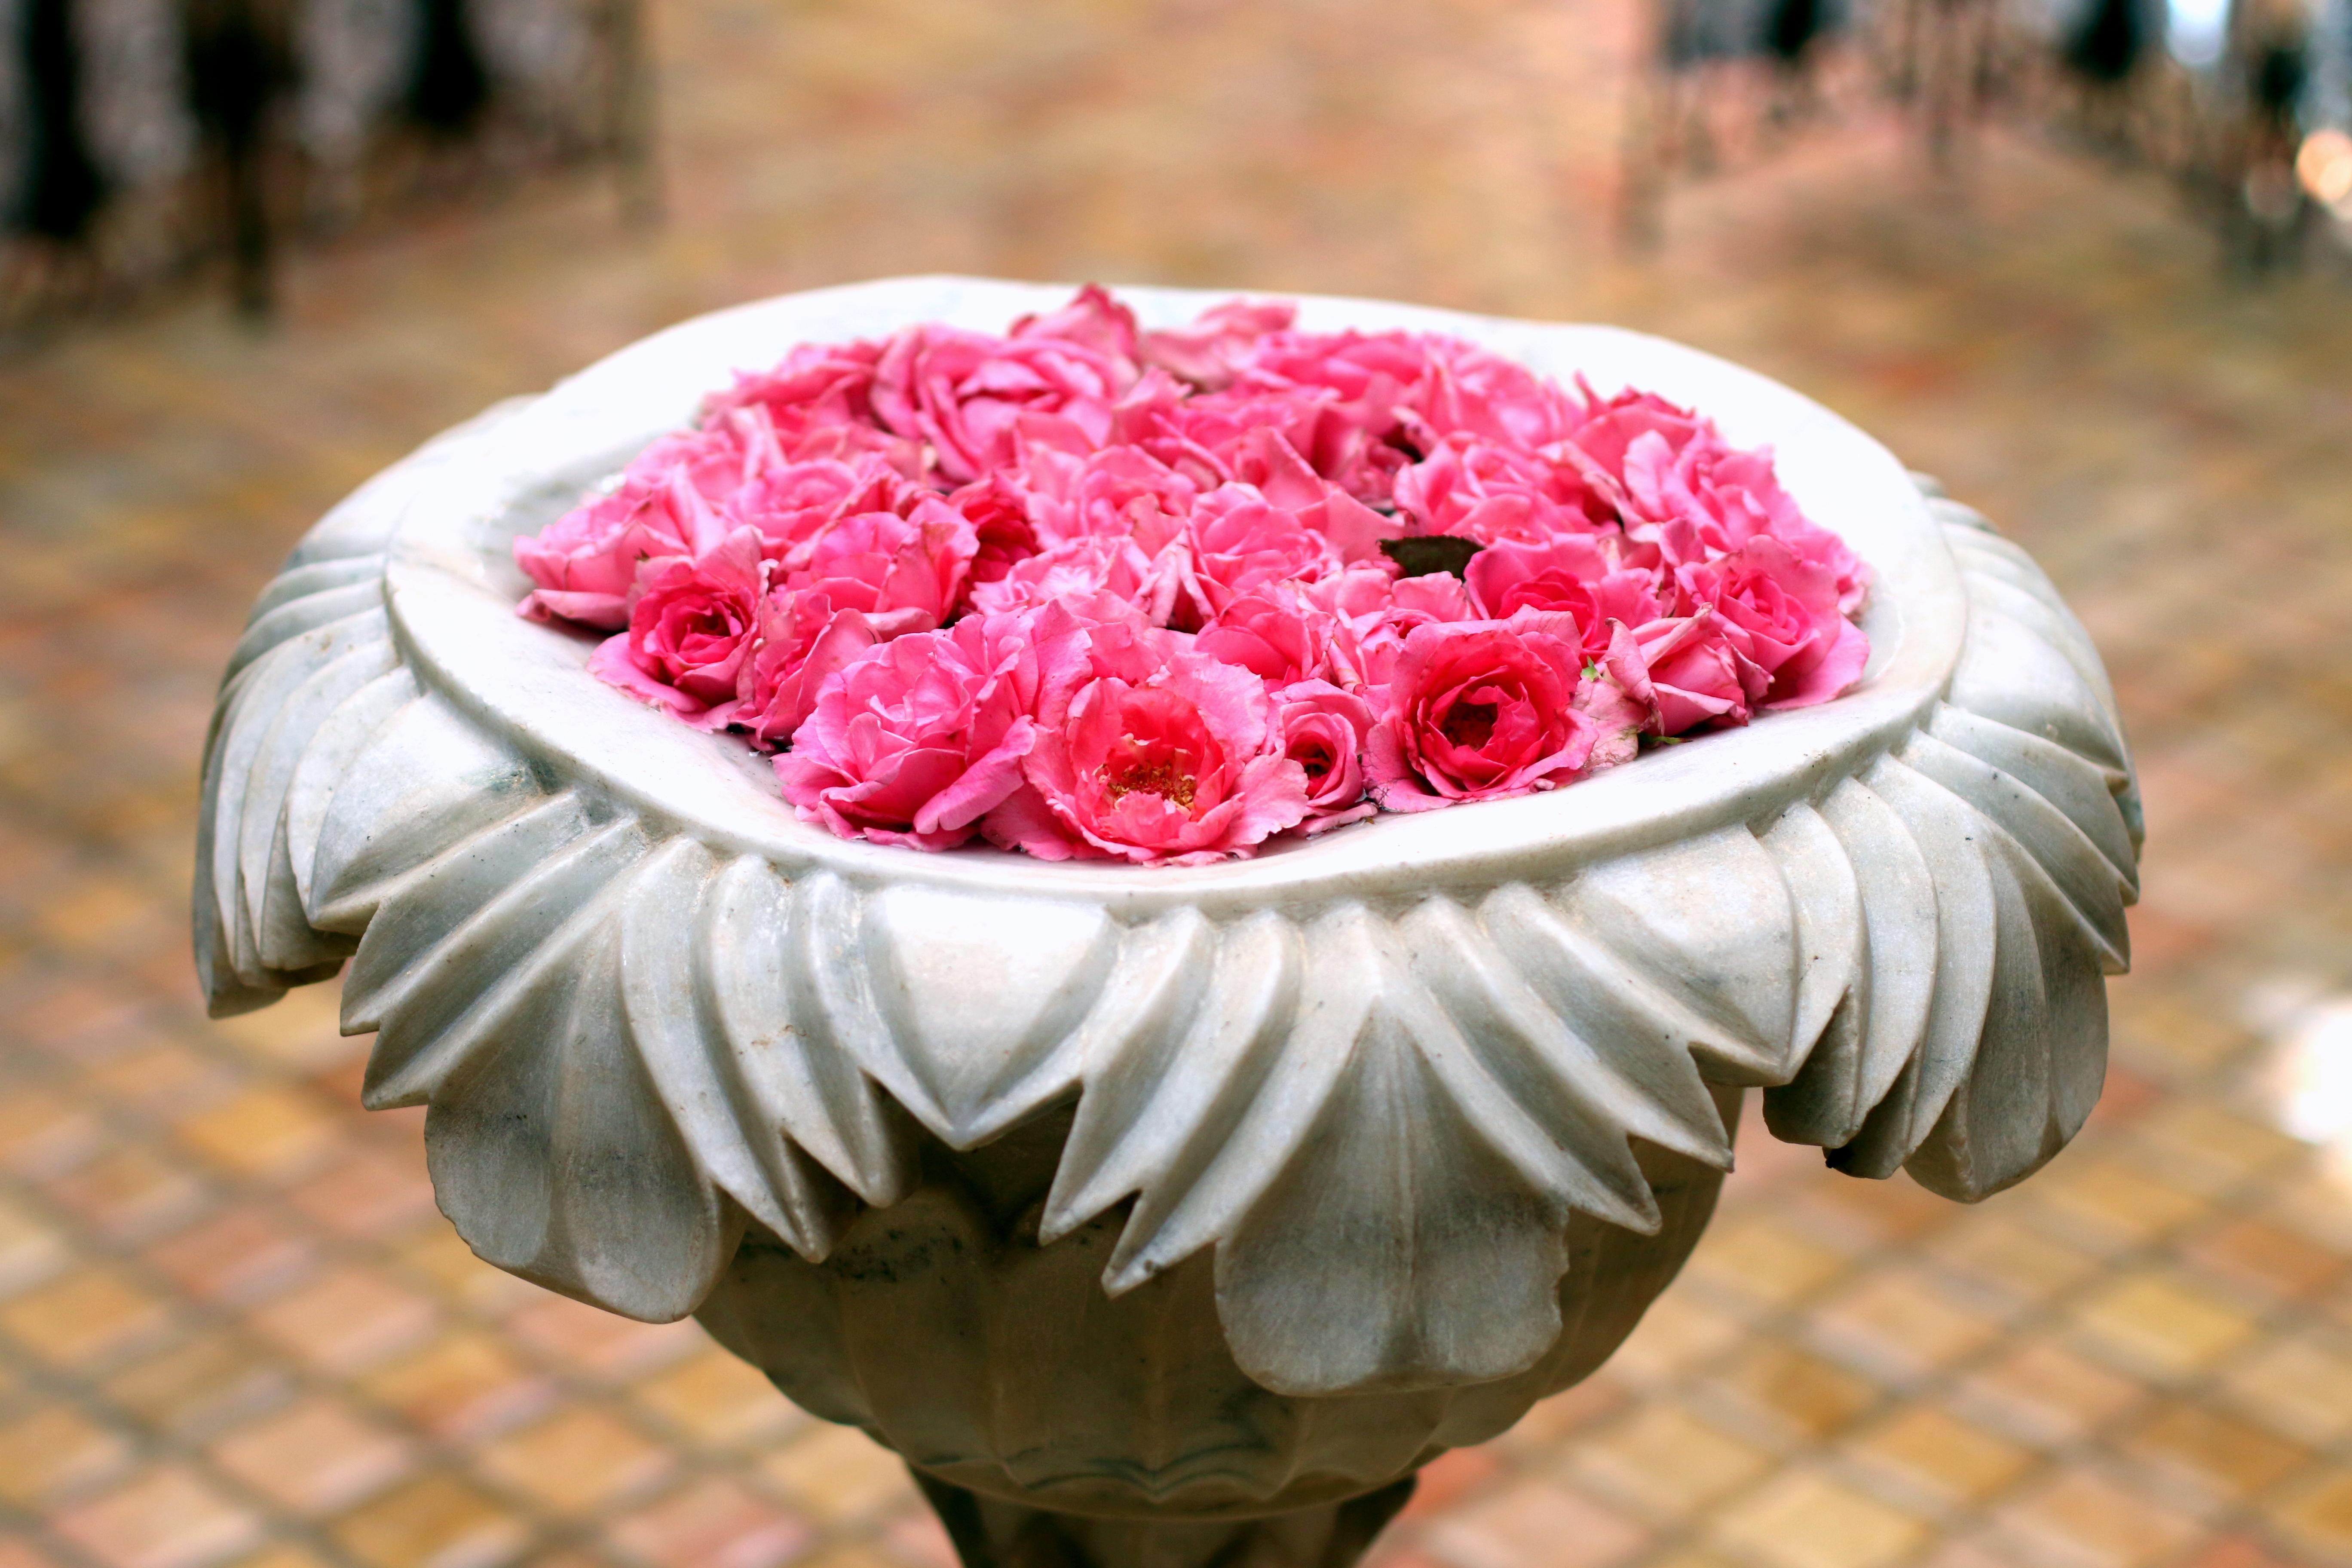 la sultana marrakech hotel review travelblog